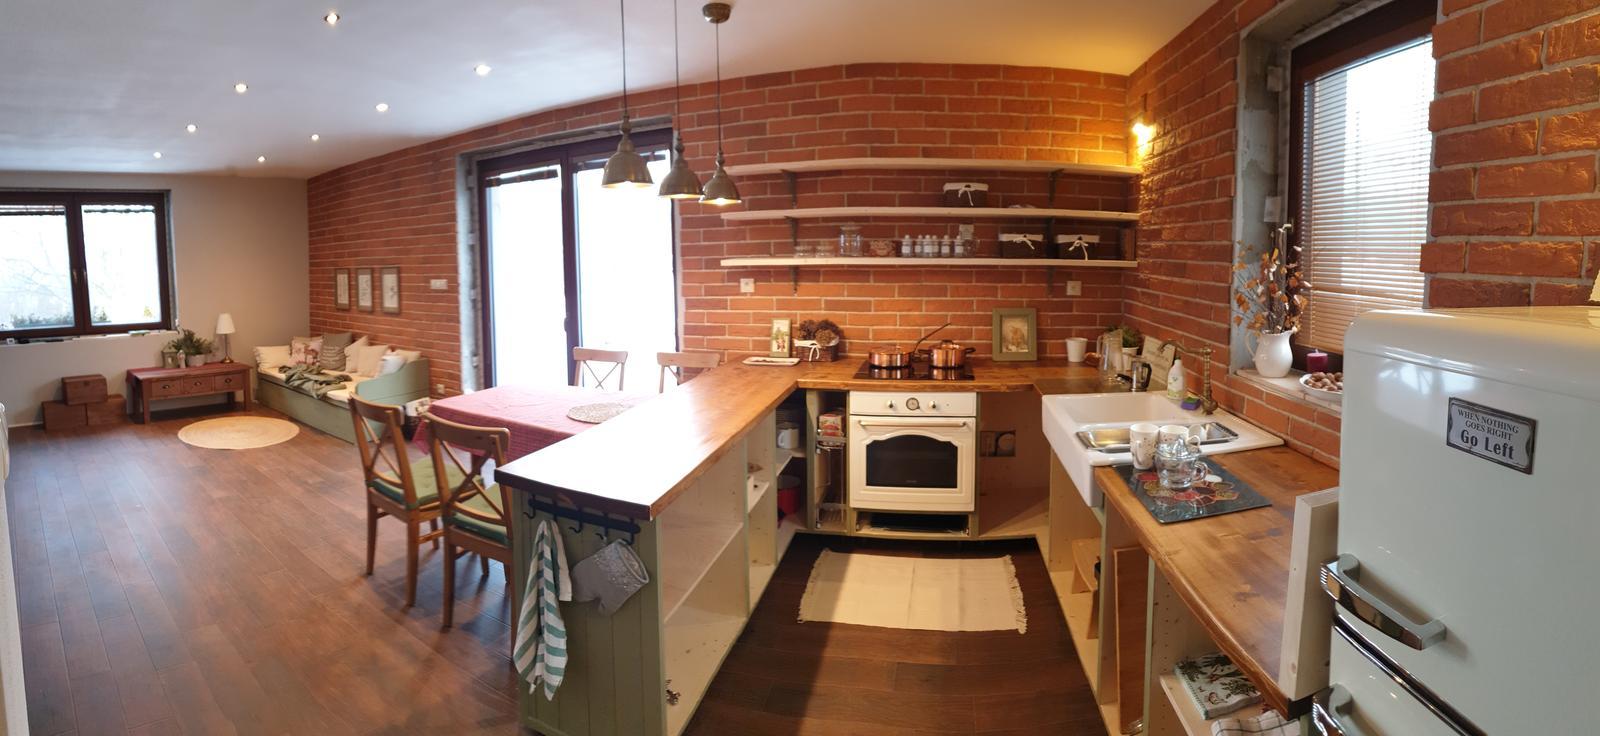 Kuchyňa svojpomocne - Panoráma z kuchyne do obývačky